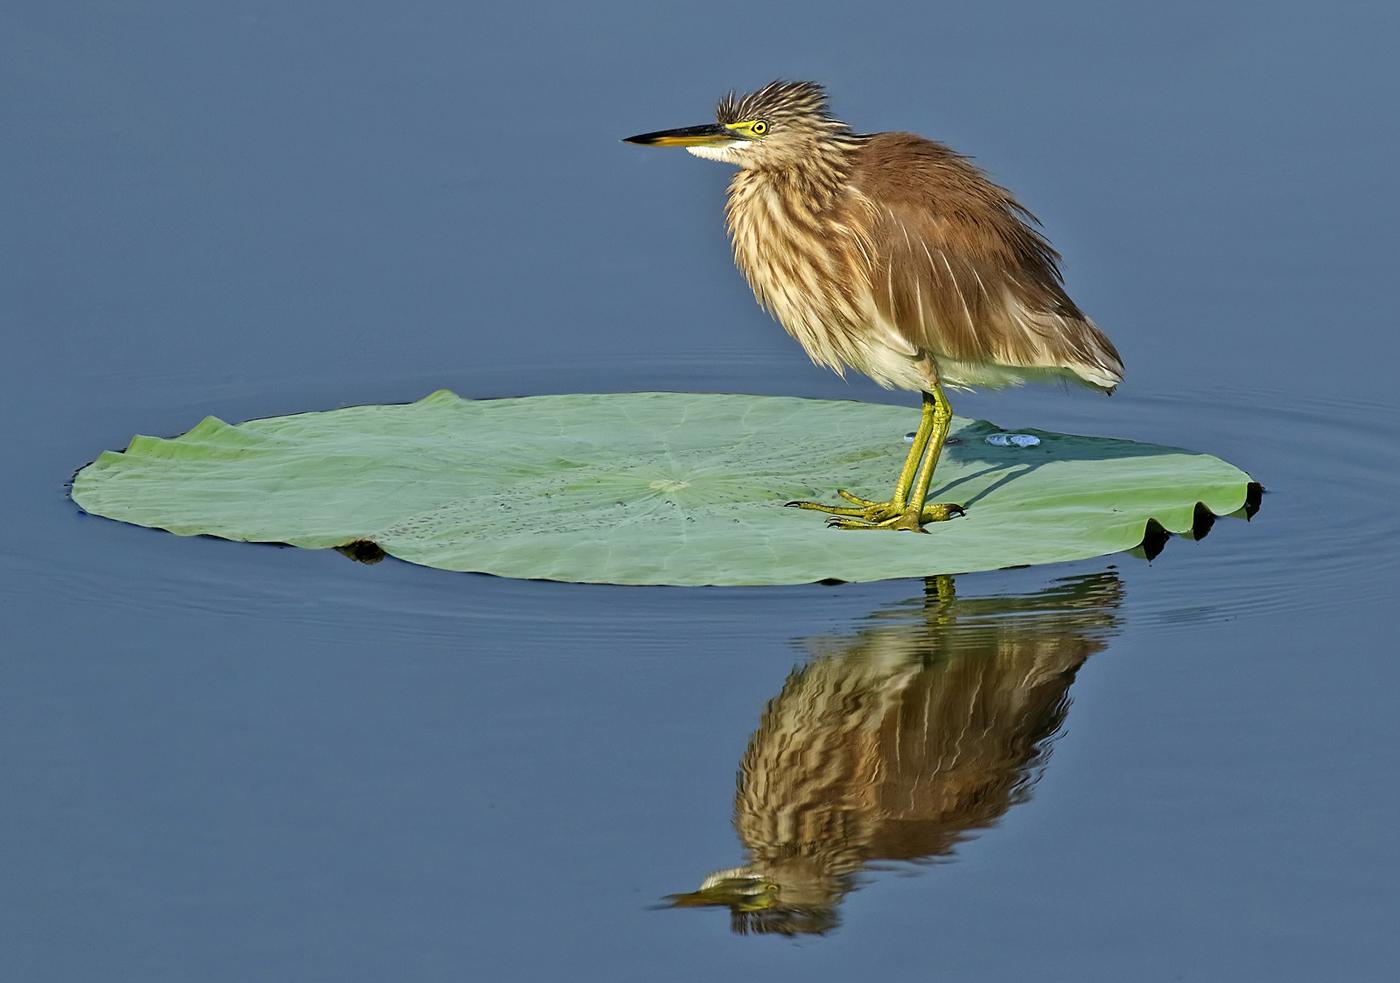 046  Indian Pond Heron reflection